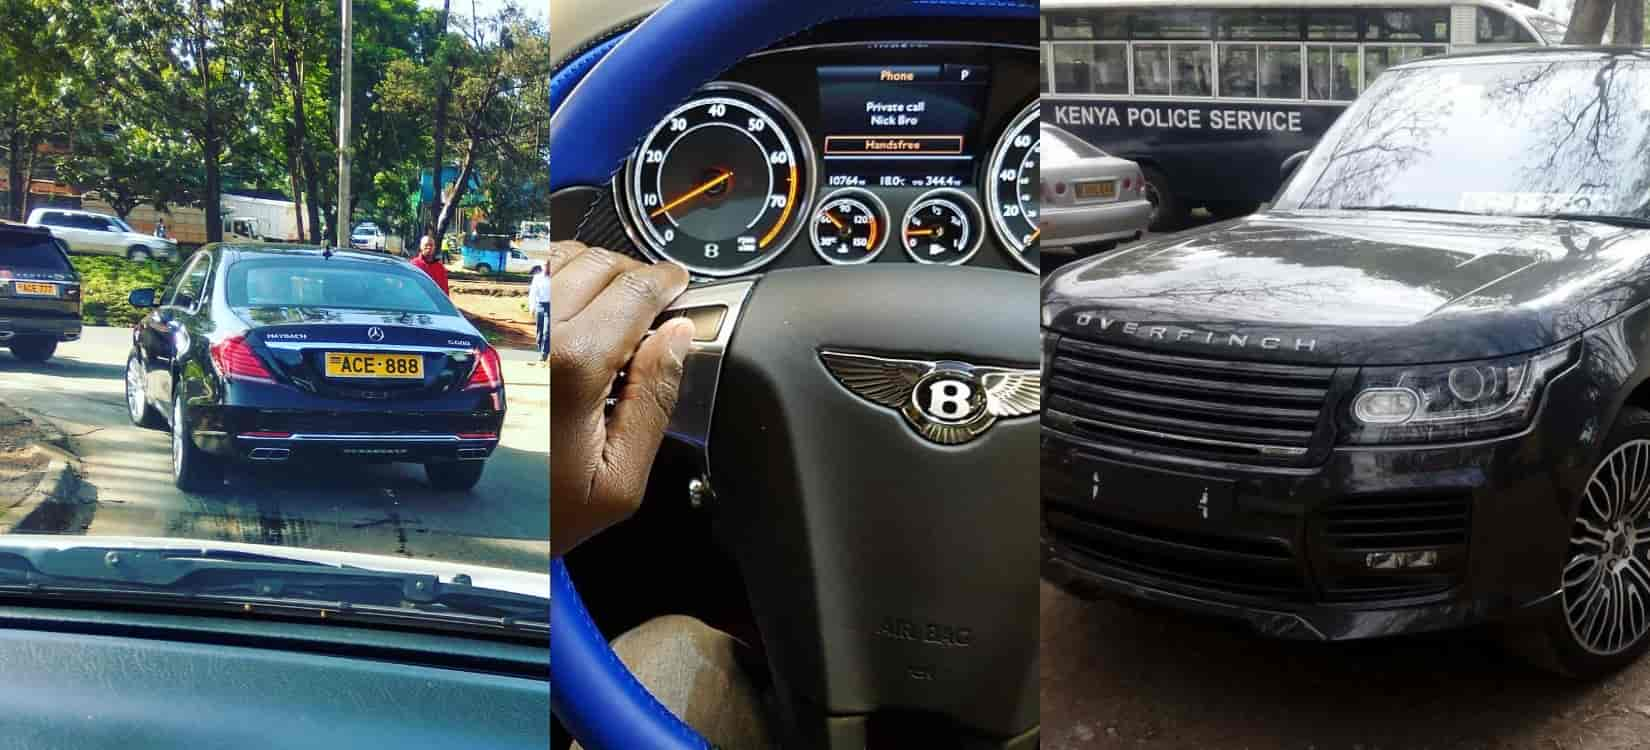 SportPesa CEO Ronald Karauri Cars Photos